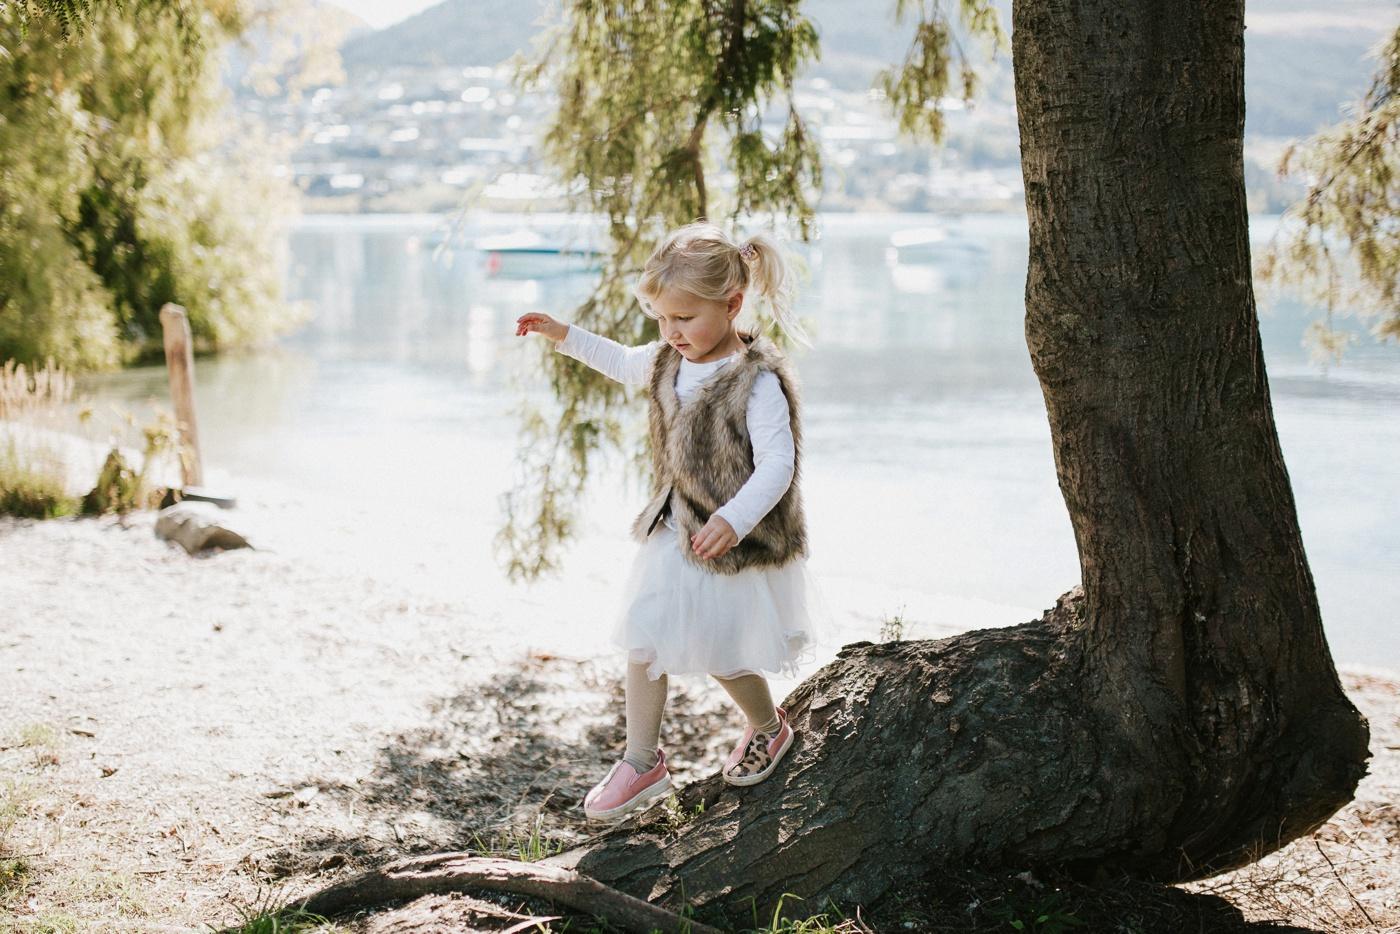 Blake-Lily-Rolig-Lekfull-Familjesession-Familjefotograf-Stockholm-Orebro_12